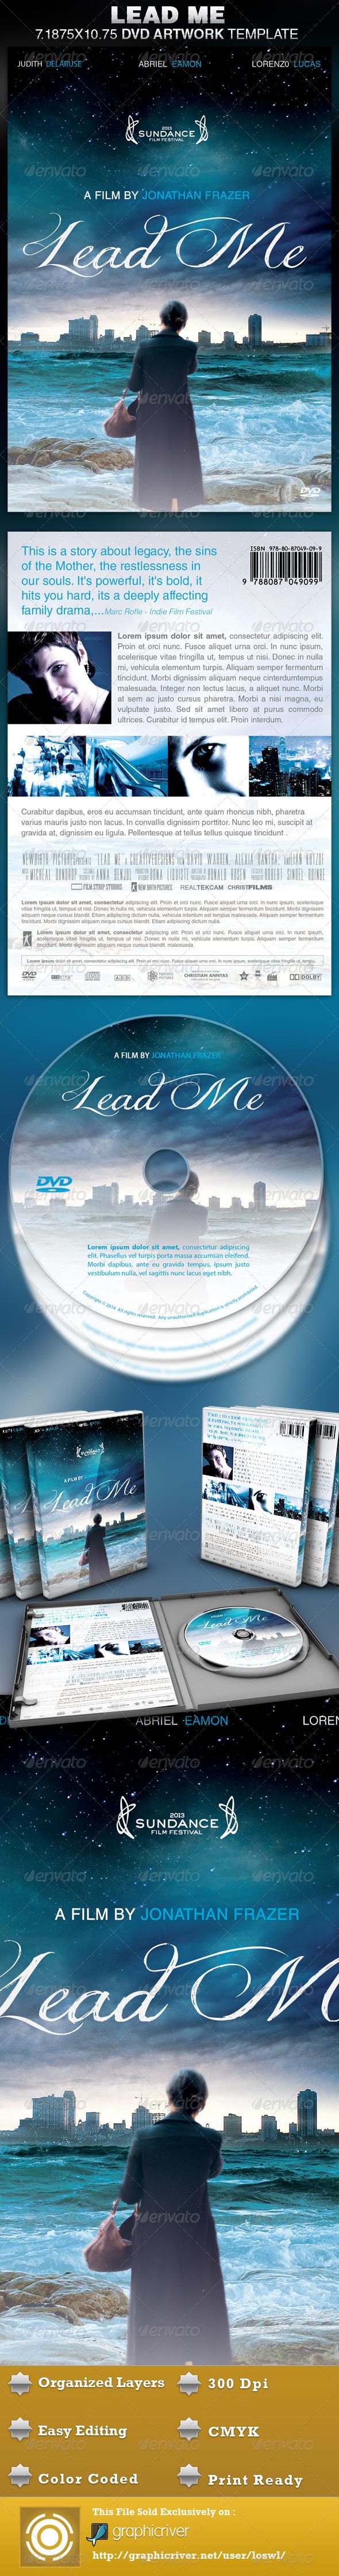 GraphicRiver Lead Me DVD Artwork Template 4650001